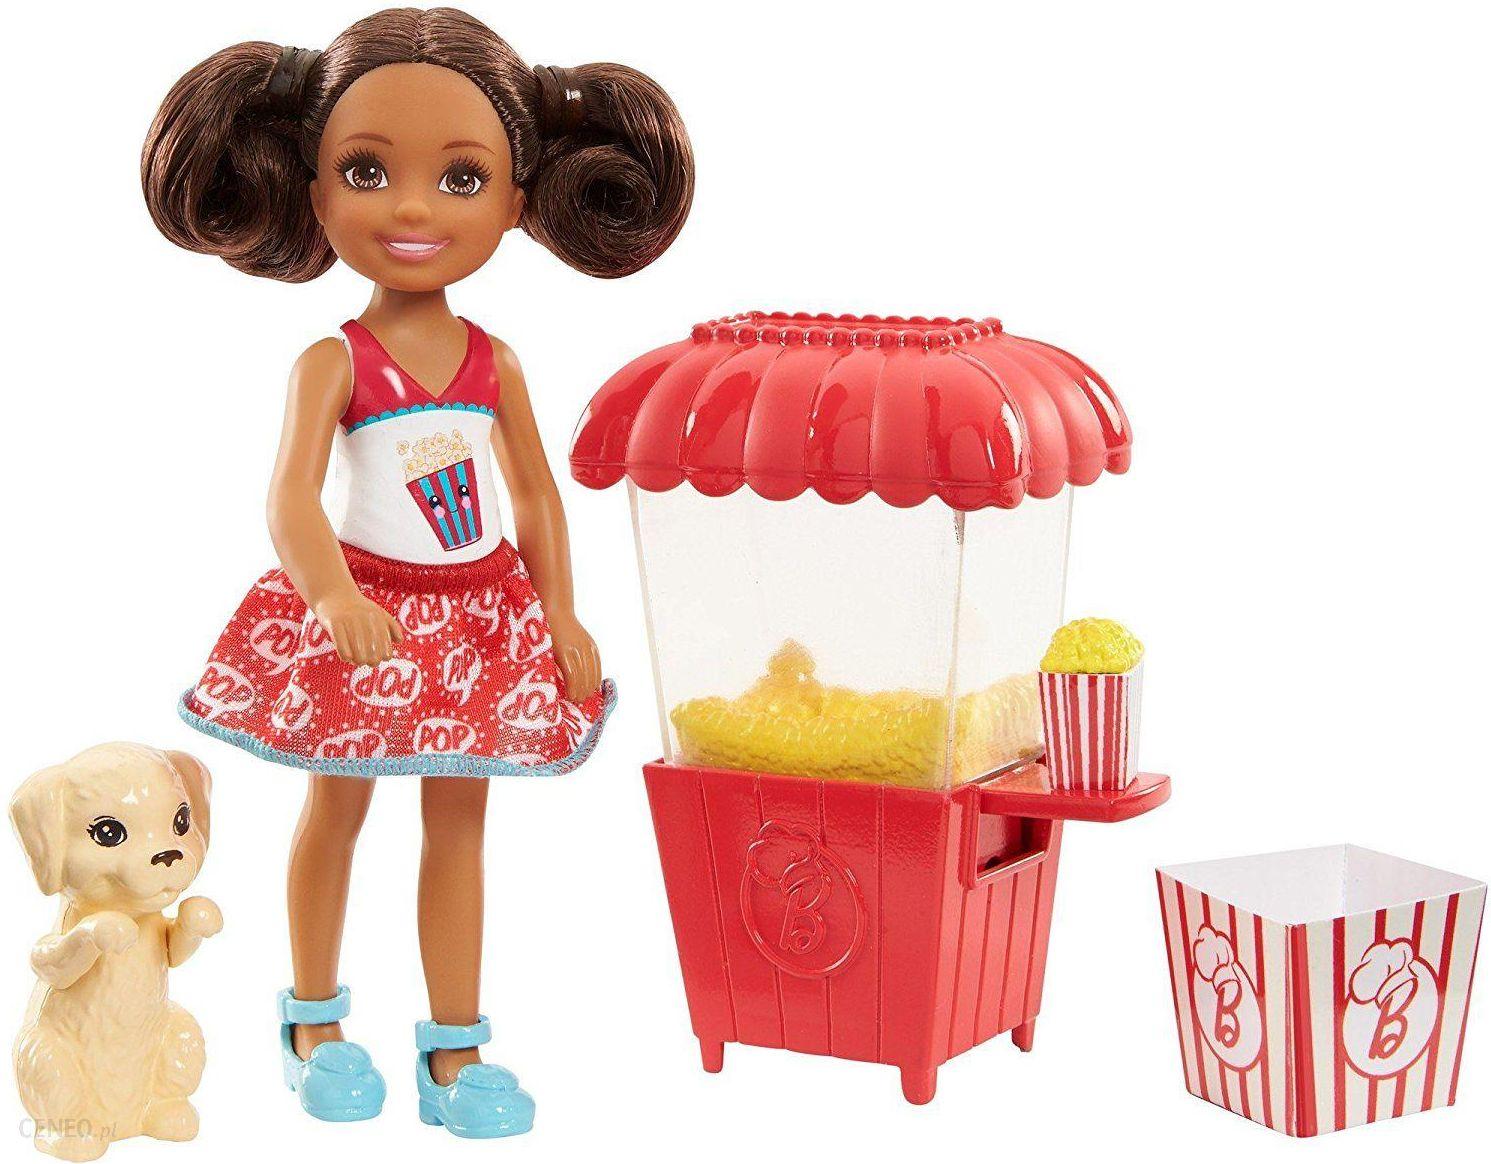 974f242b1 Lalka Barbie Lalka Chelsea brunetka z popcornem FHP66 FHP68 - Ceny i ...